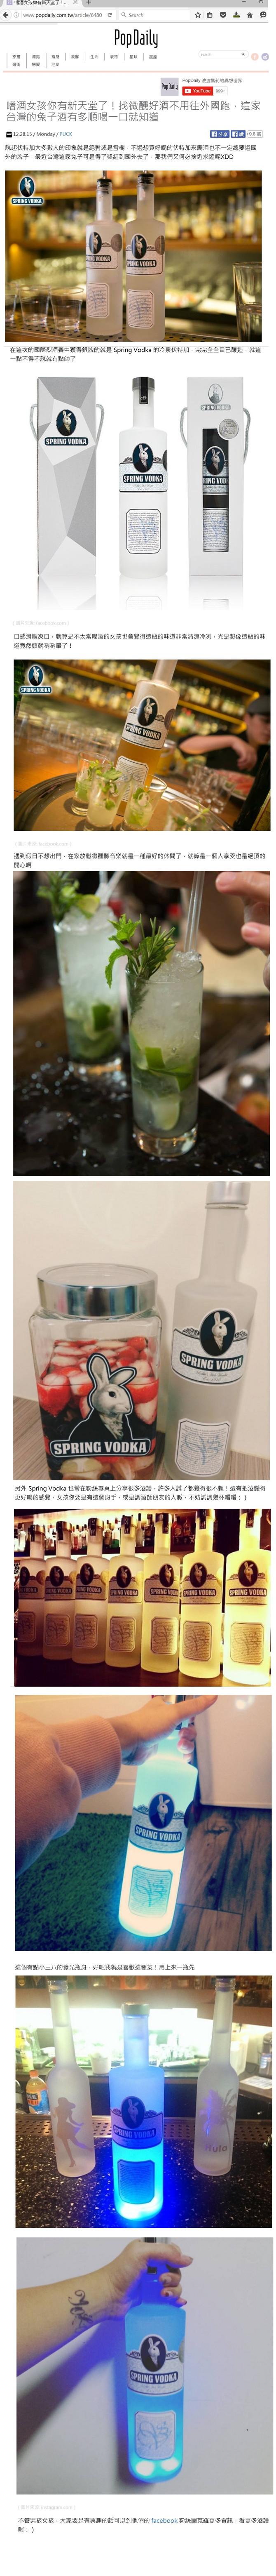 Popdaily 波波黛莉 報導Spring Vodka 兔兔酒